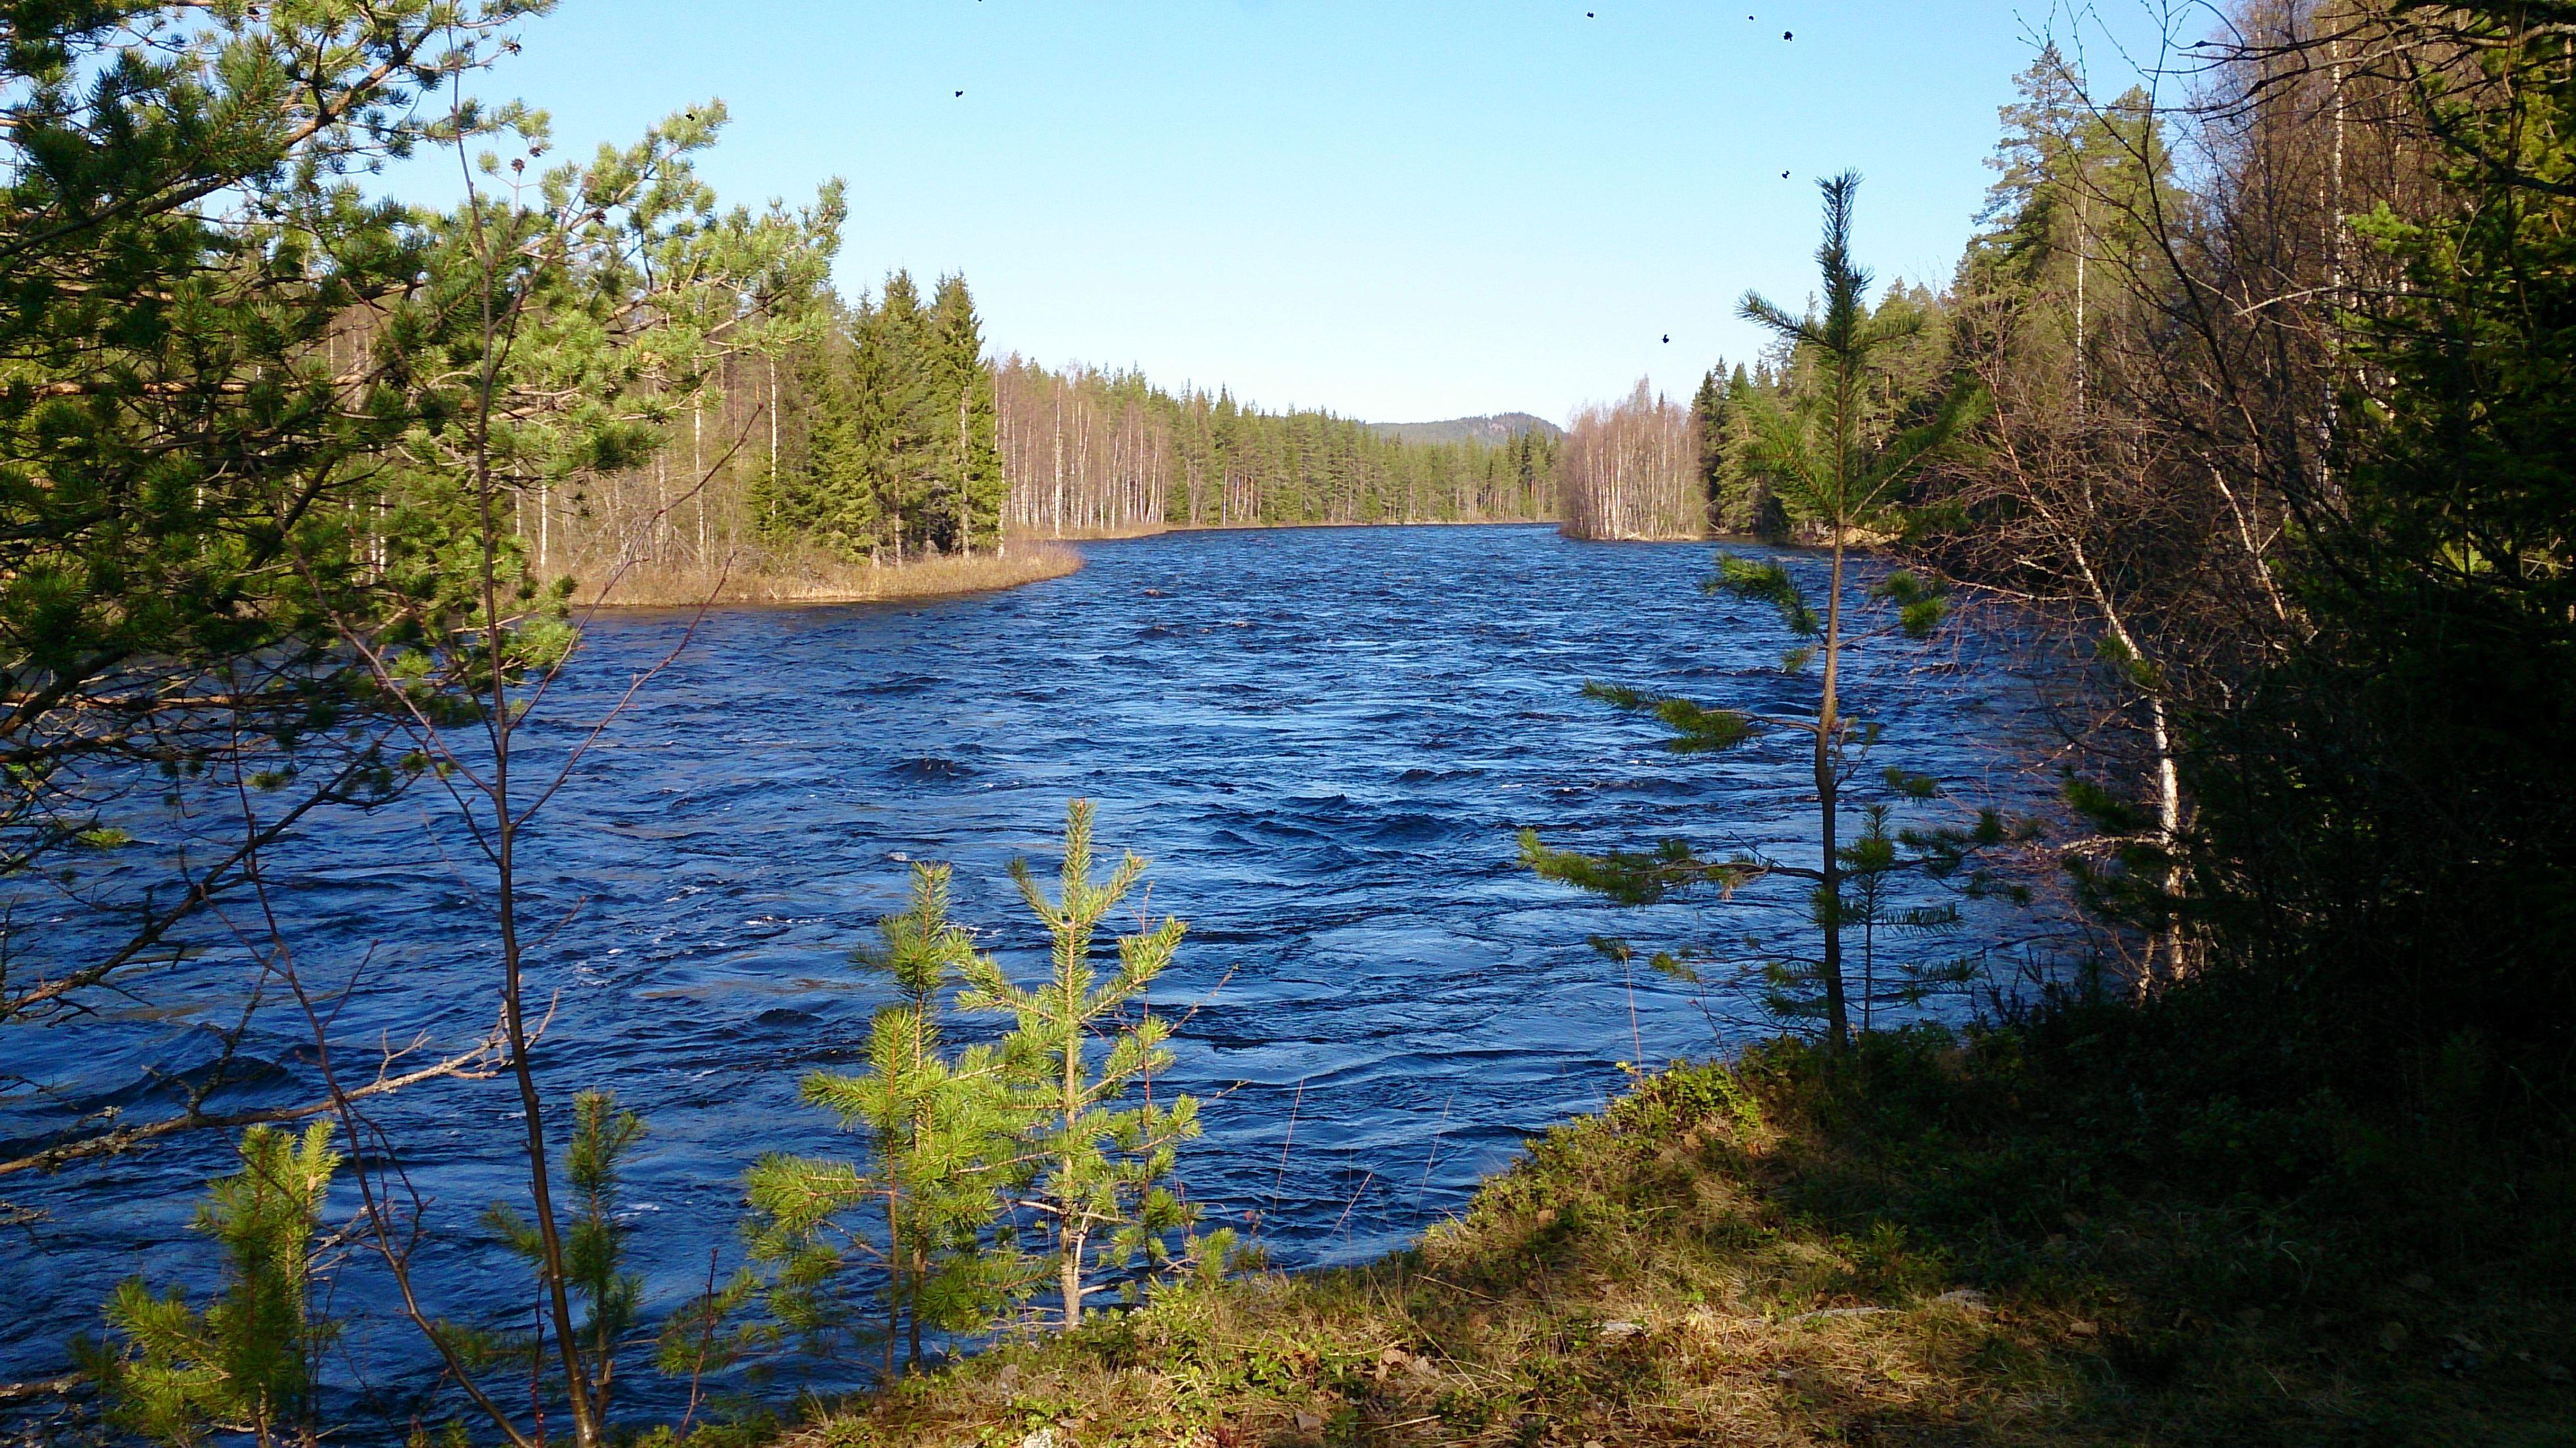 Claudia Wieczorek,  © Bjurholms kommun, The Öreälven River Trail